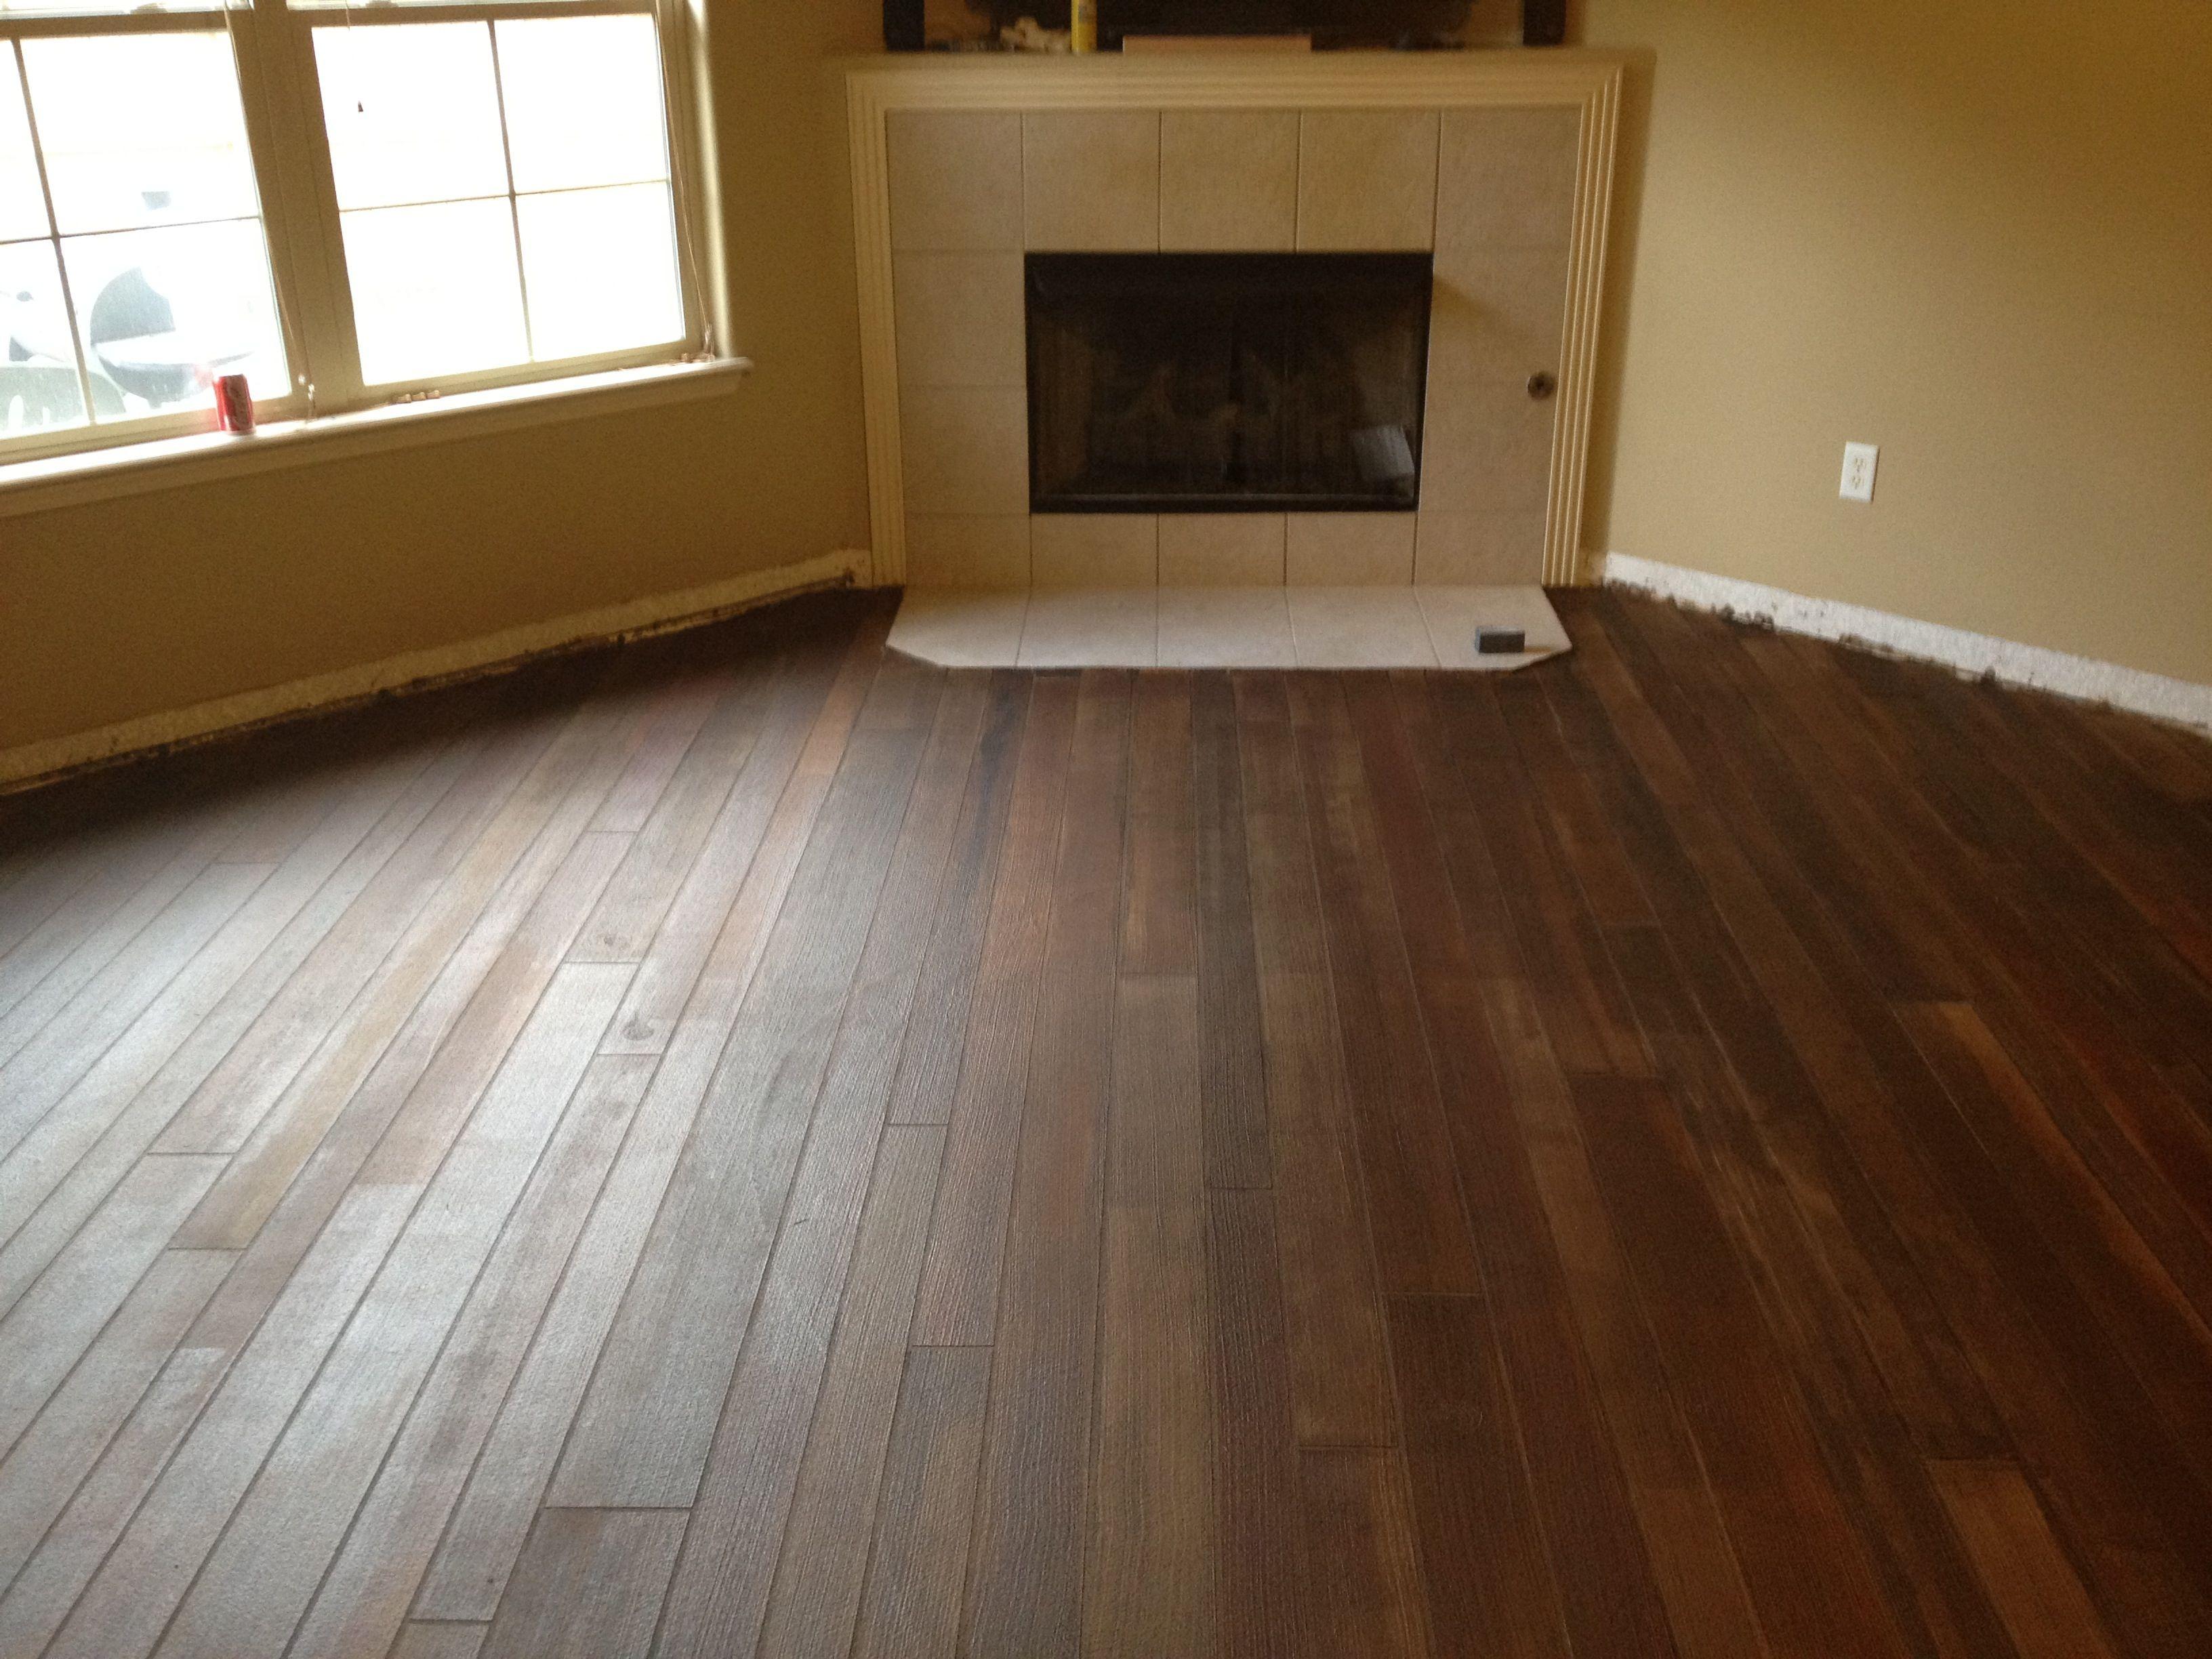 Diagonal Concrete Floor Made To Look Like Wood Harmon